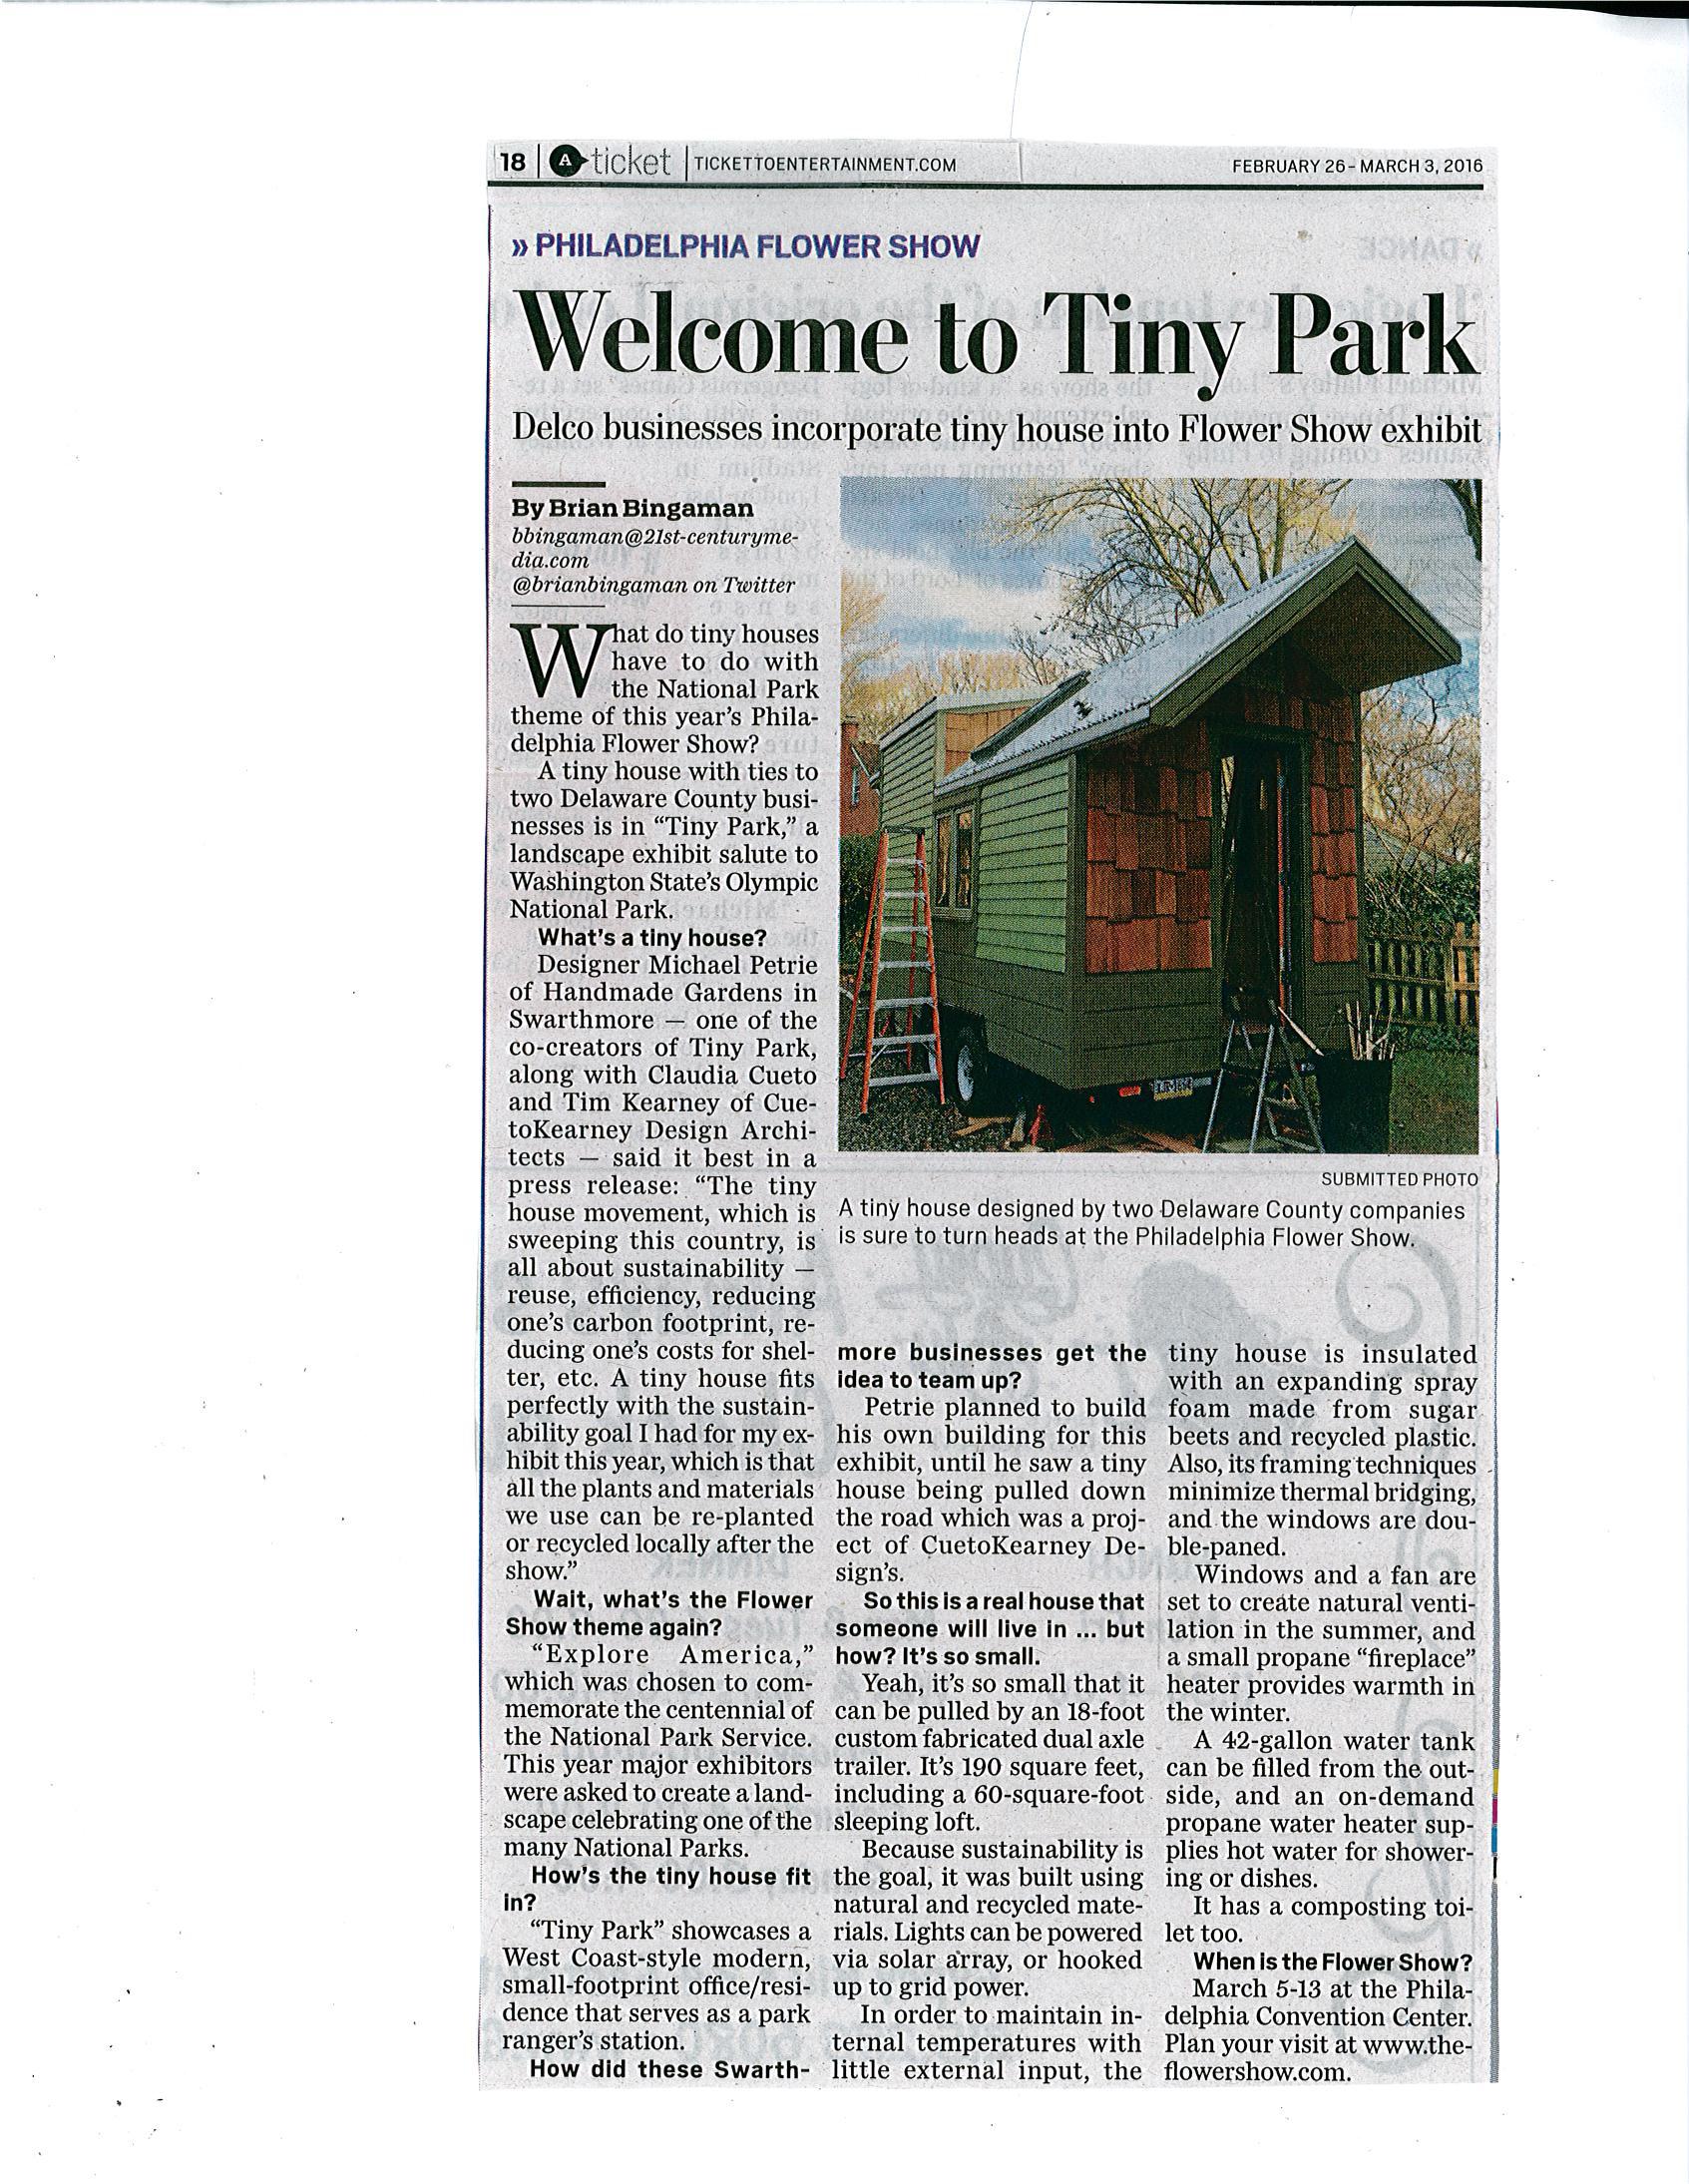 CKd Tiny House 2-2016 Ticket Article.jpg